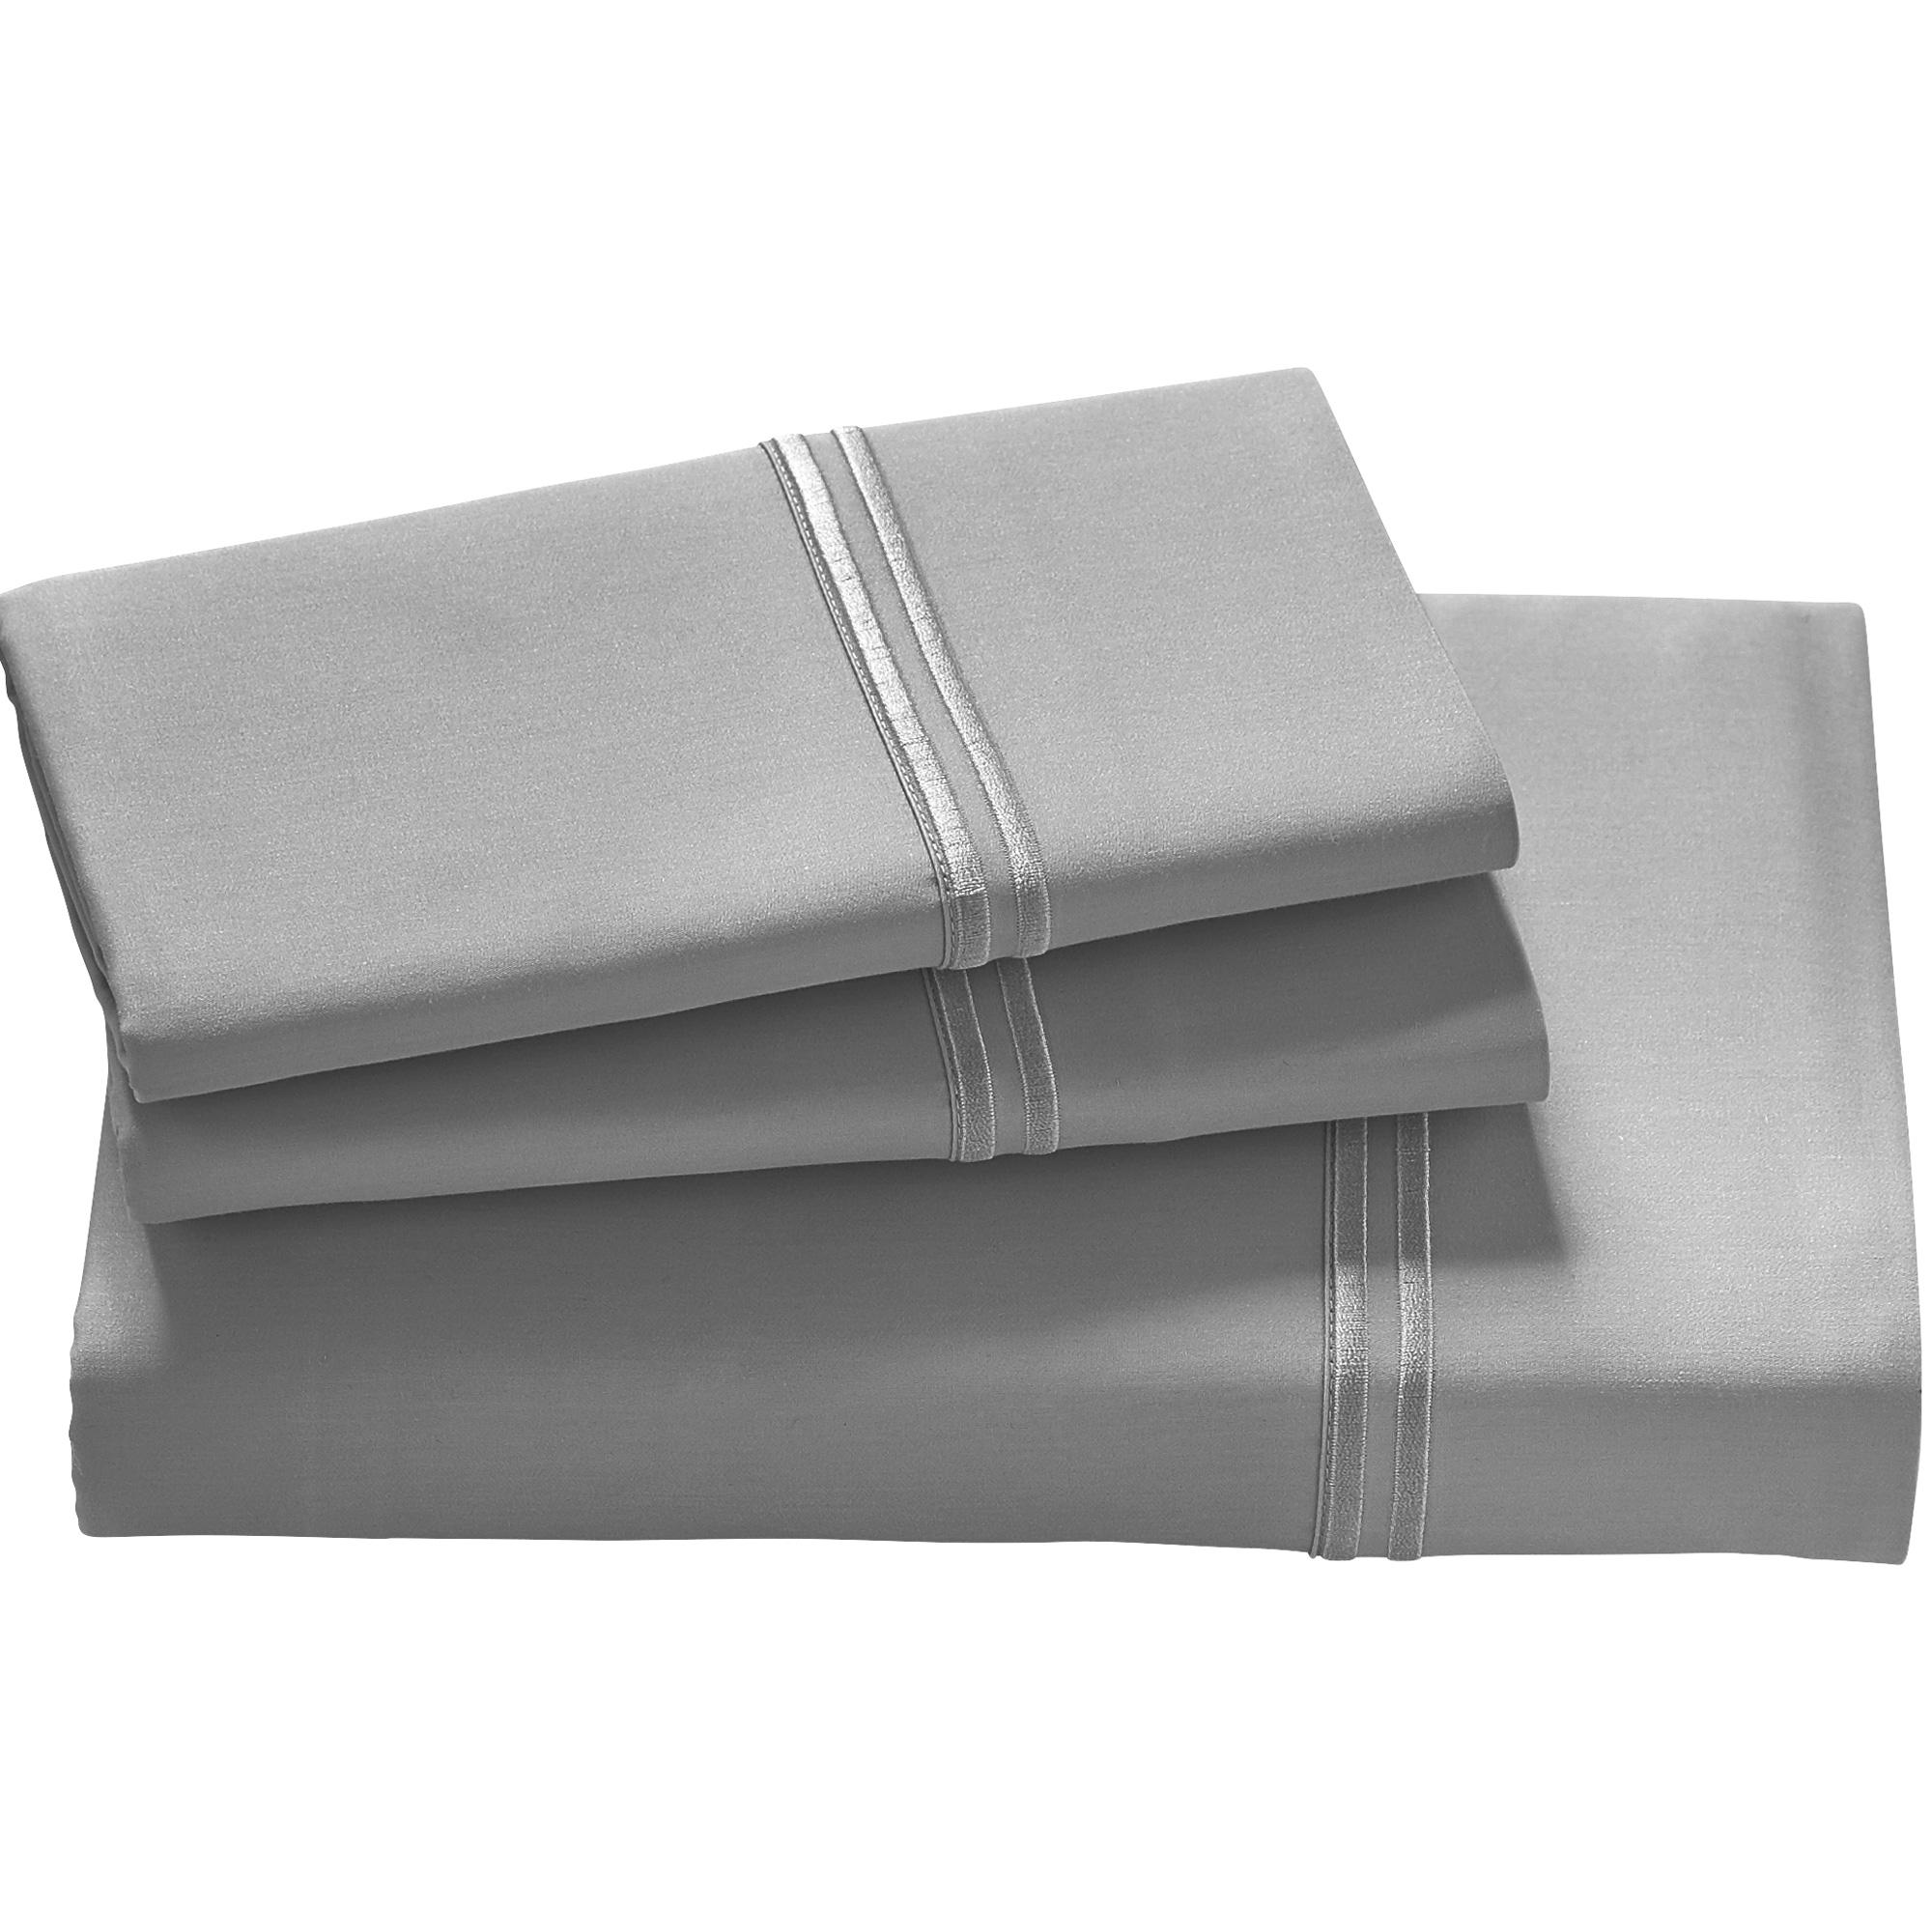 Purecare | Elements Dove Gray King Tencel Pillowcase